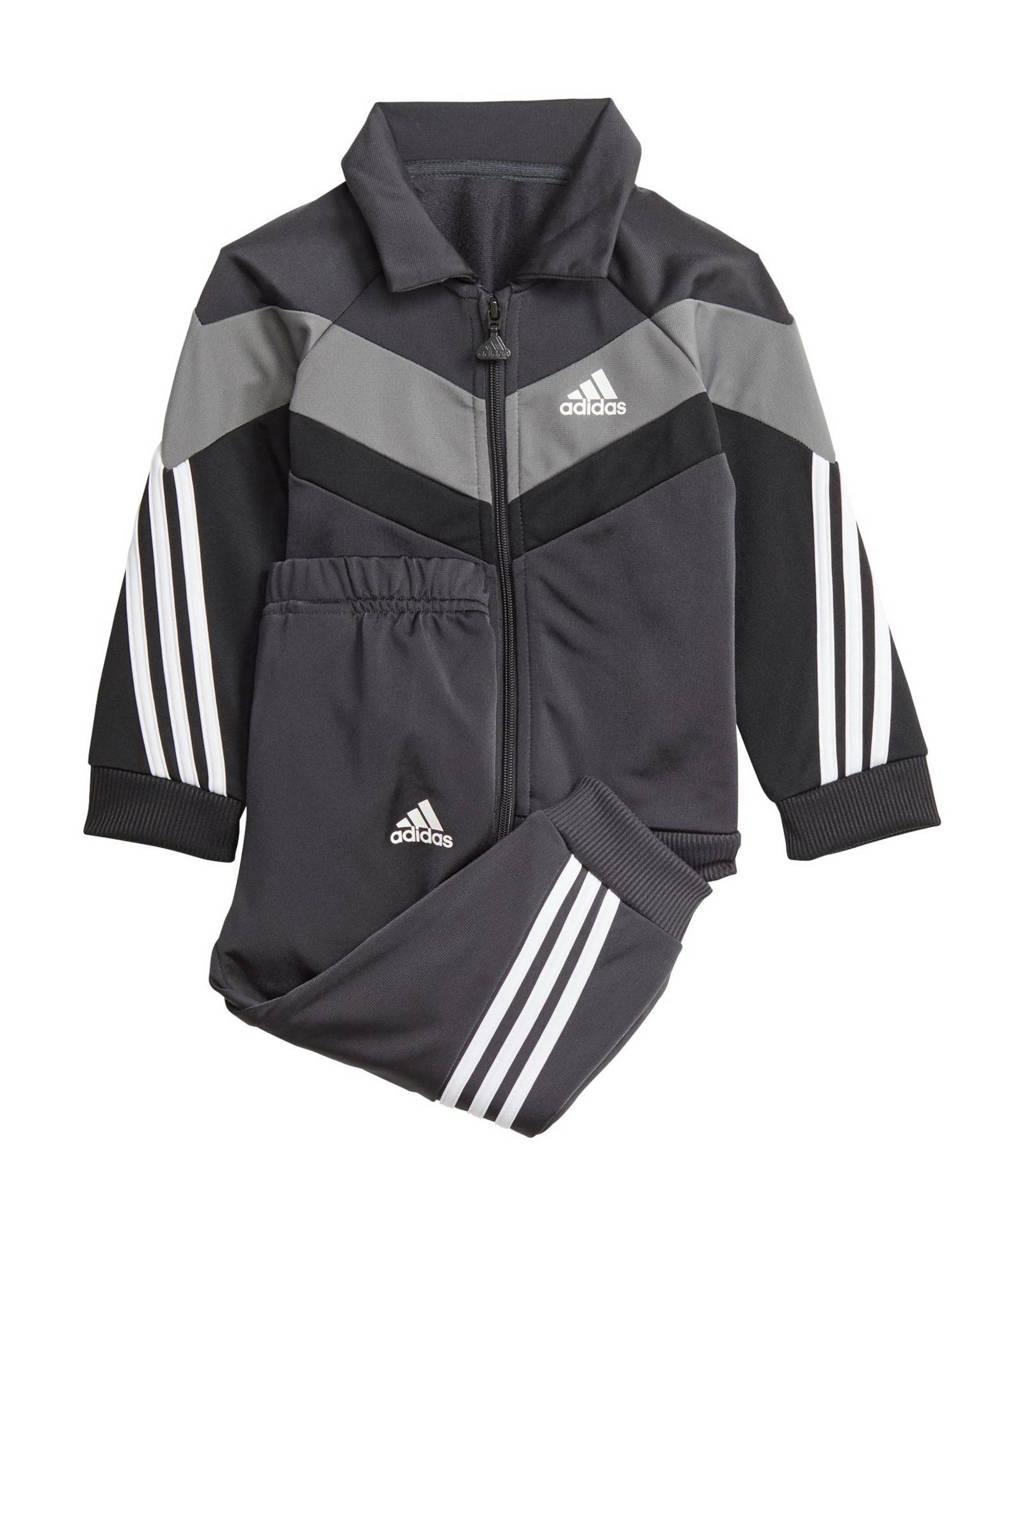 adidas Performance   trainingspak antraciet/zwart/wit, Antraciet/wit/zwart